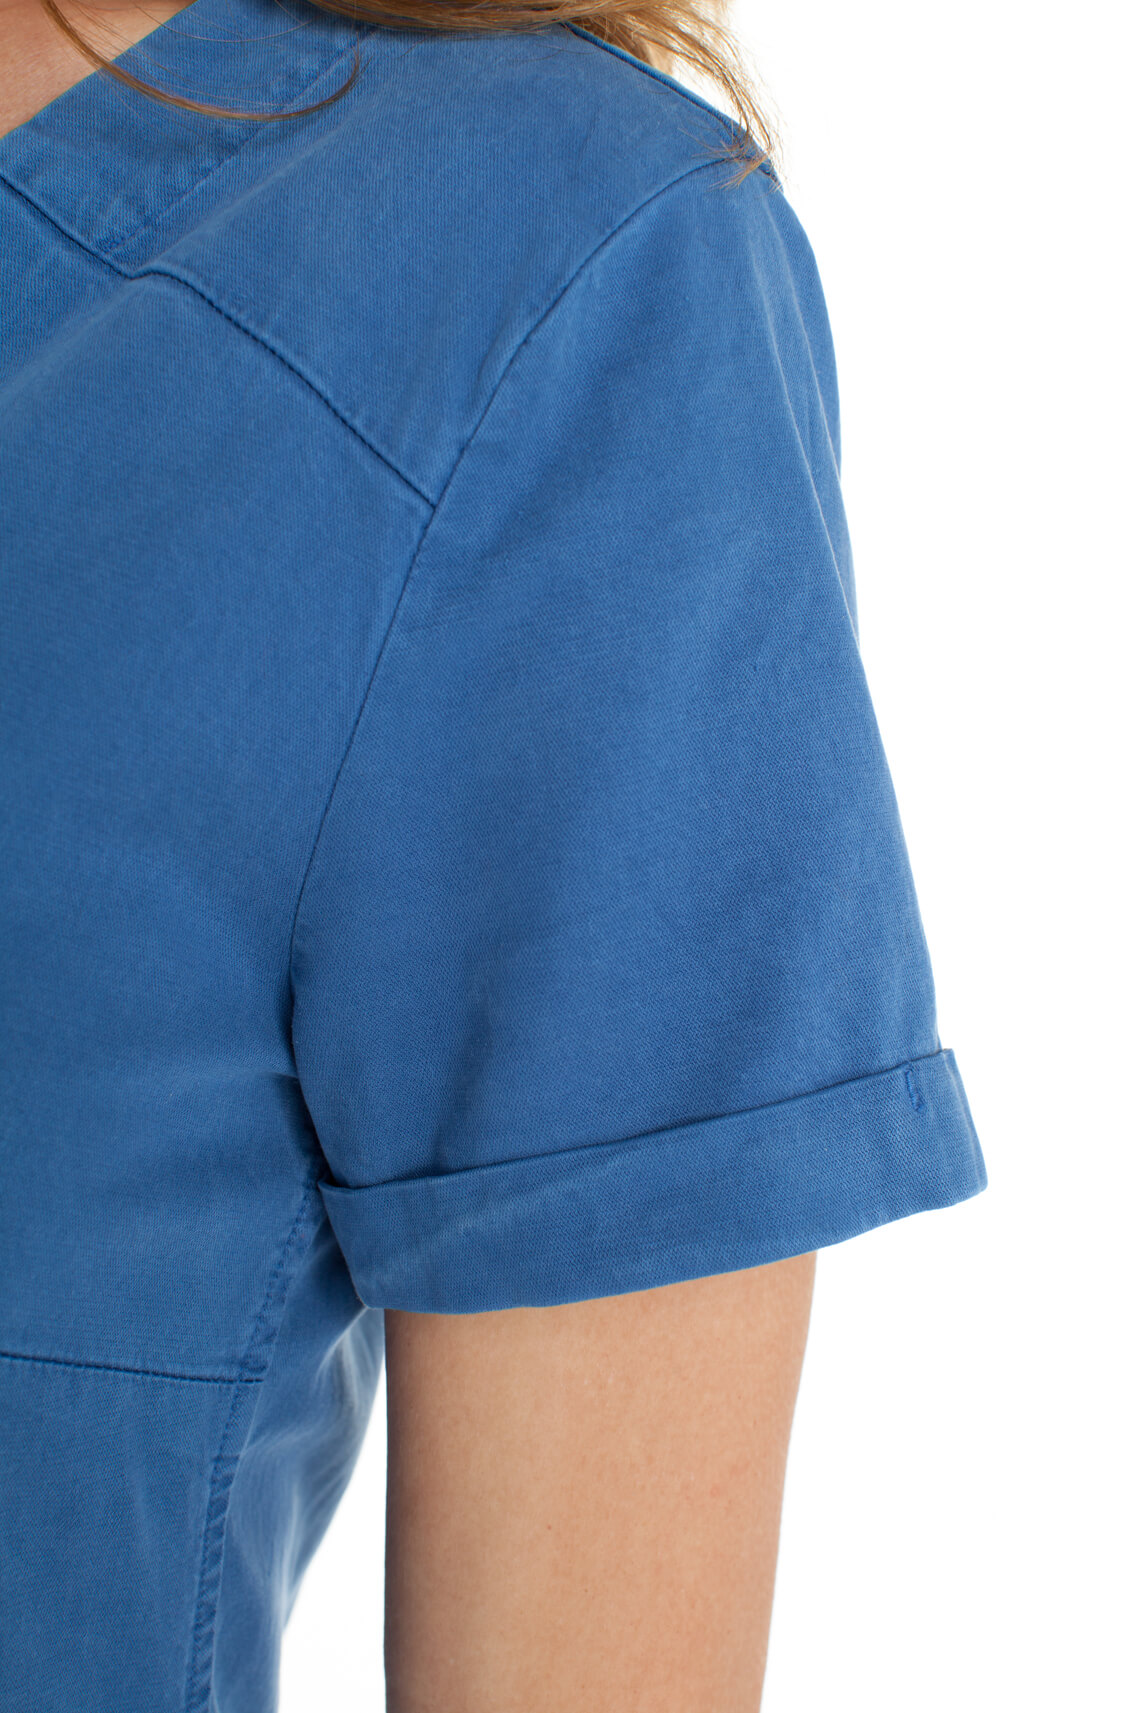 Anna Blue Dames Tencel jurk Blauw